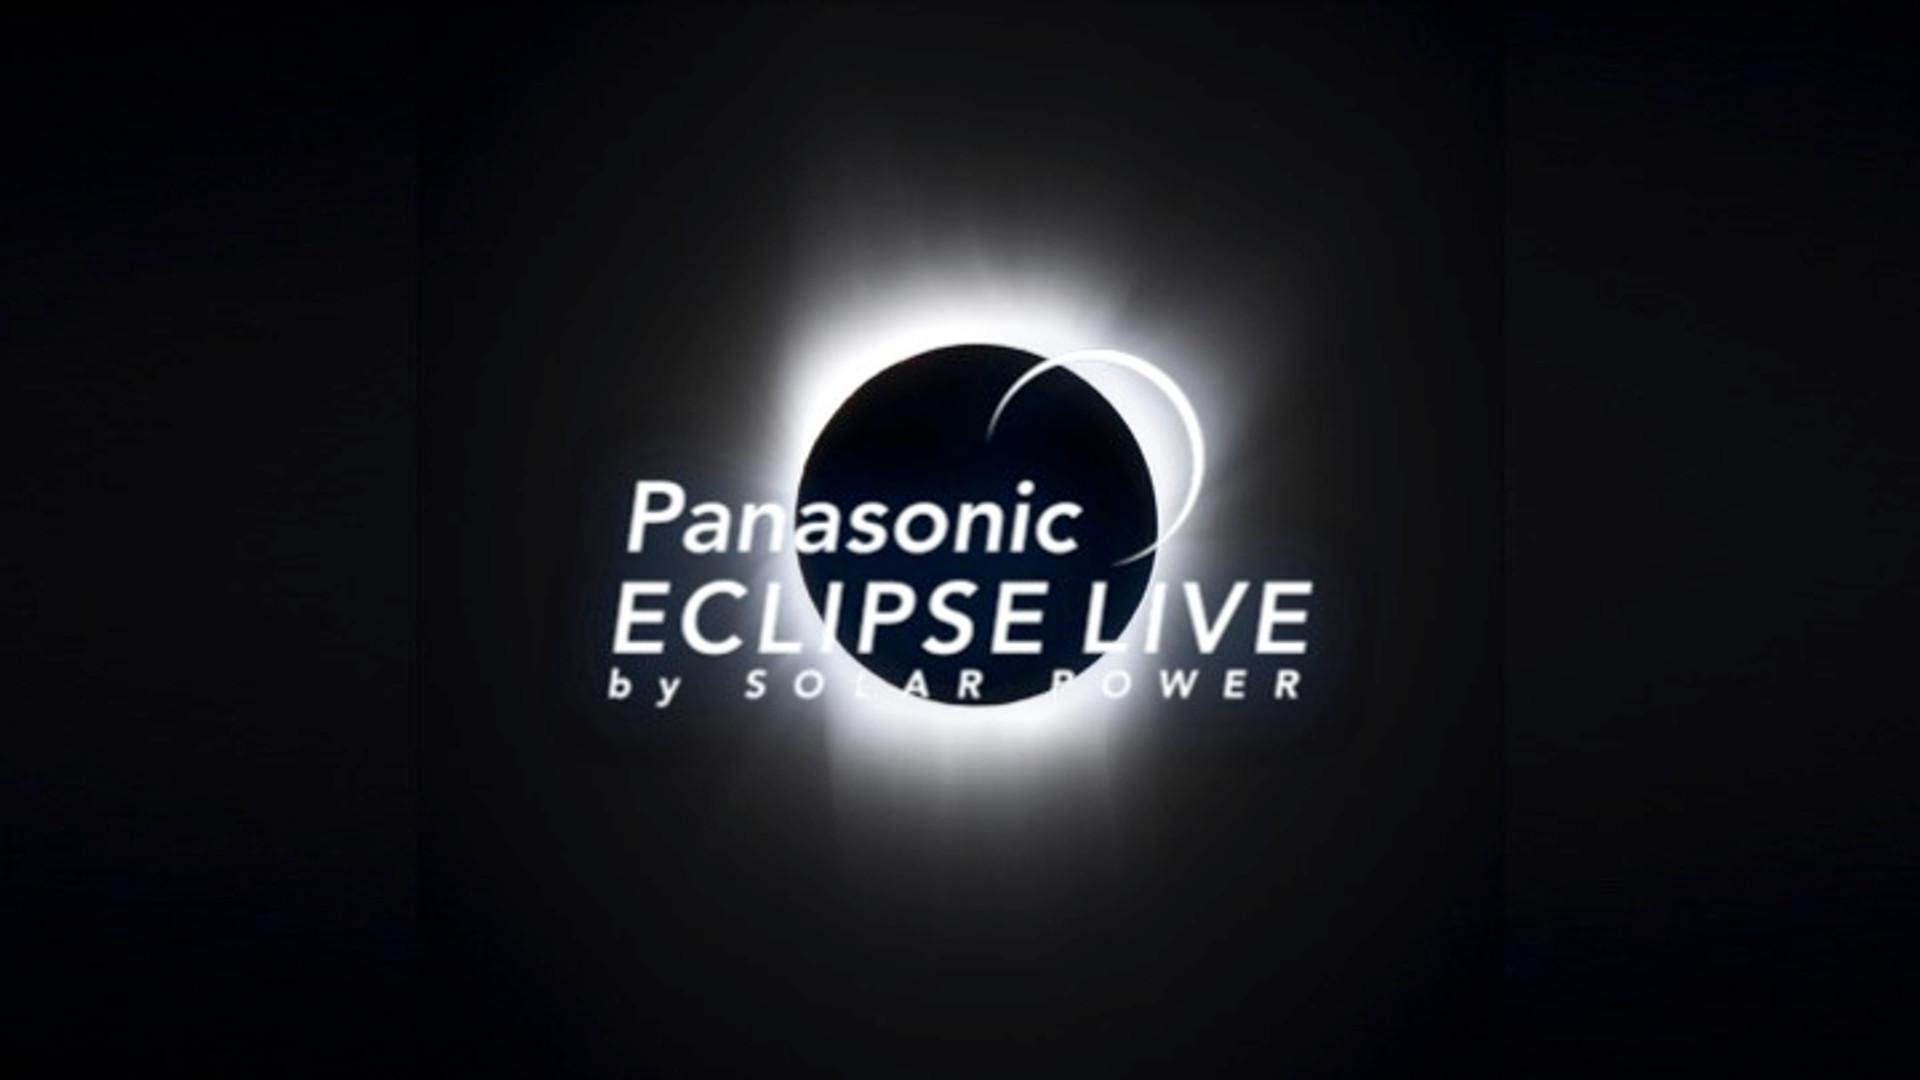 Panasonic / Eclipse Live by Solar Power